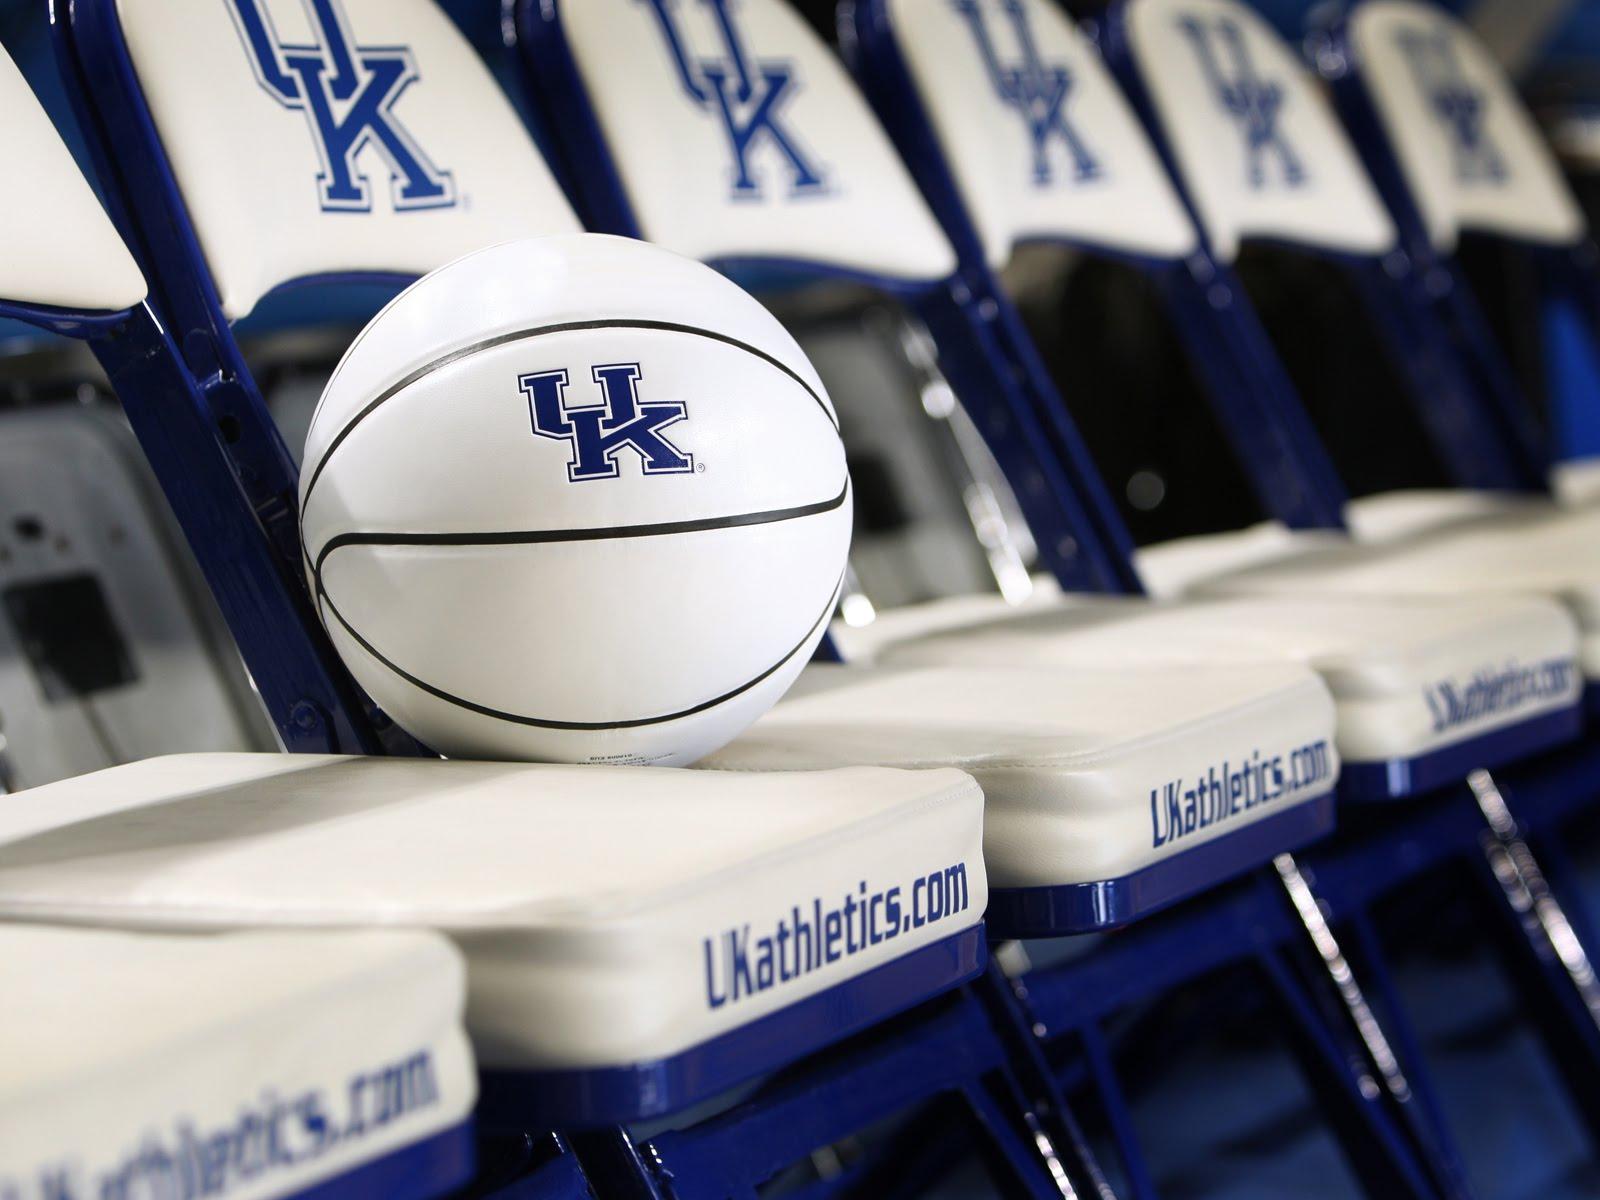 Kentucky Basketball Images Go Big Blue Hd Wallpaper And: Big Blue Booyah: April 2010